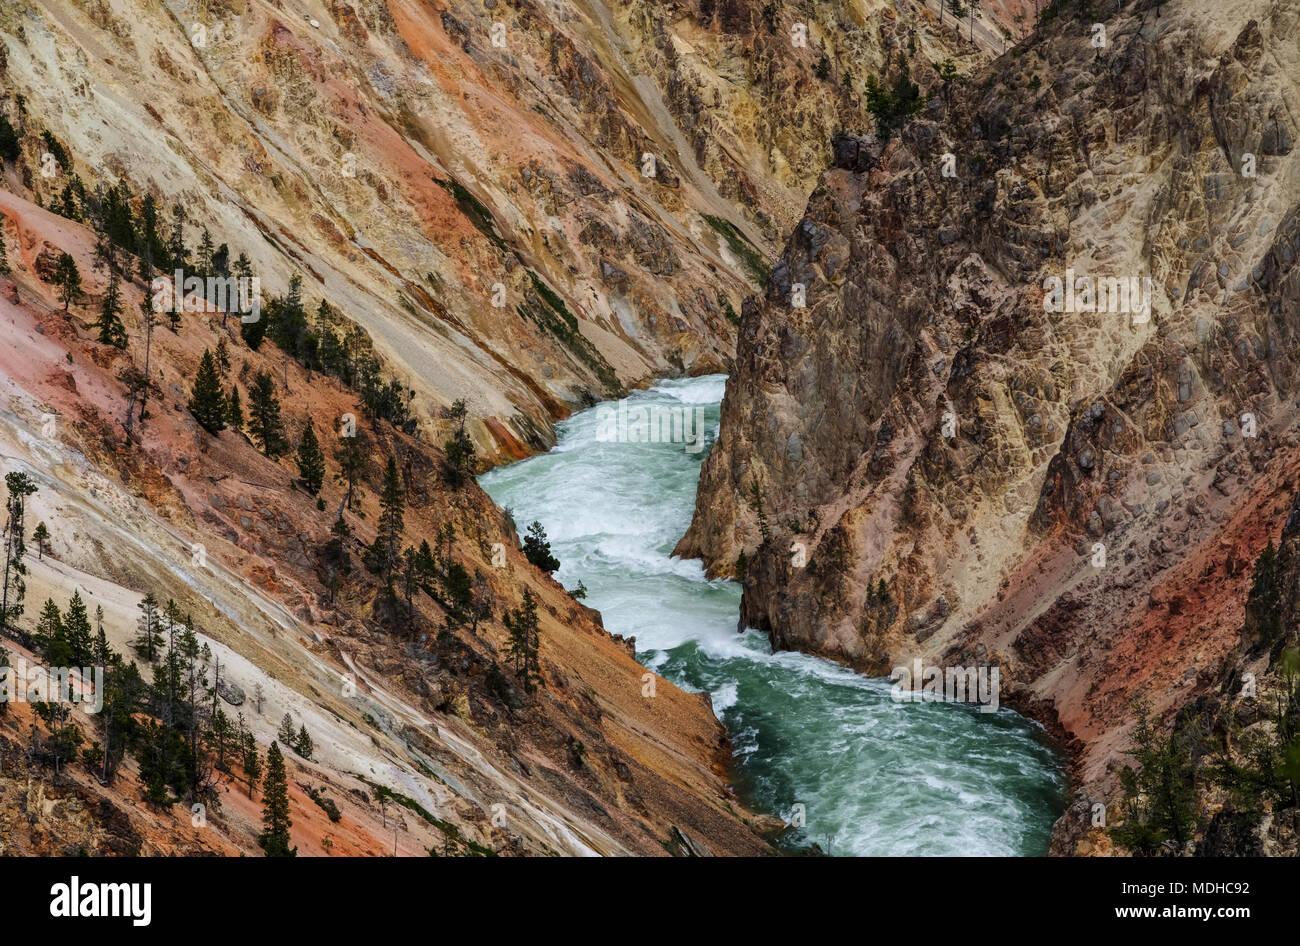 Yellowstone Río fluyendo a través del cañón, el Parque Nacional Yellowstone, Wyoming, Estados Unidos de América Imagen De Stock